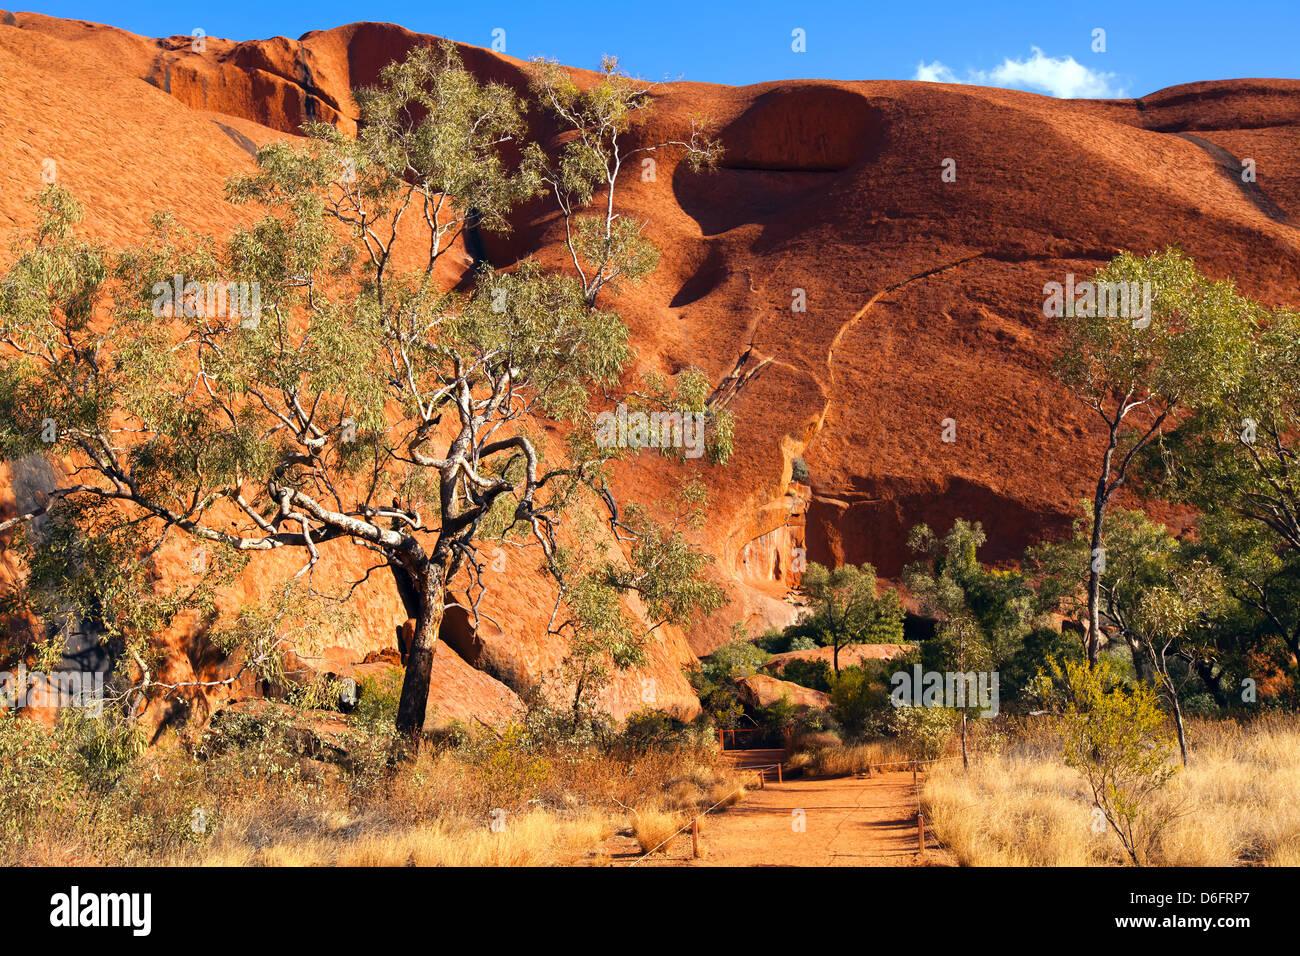 Australie paysage